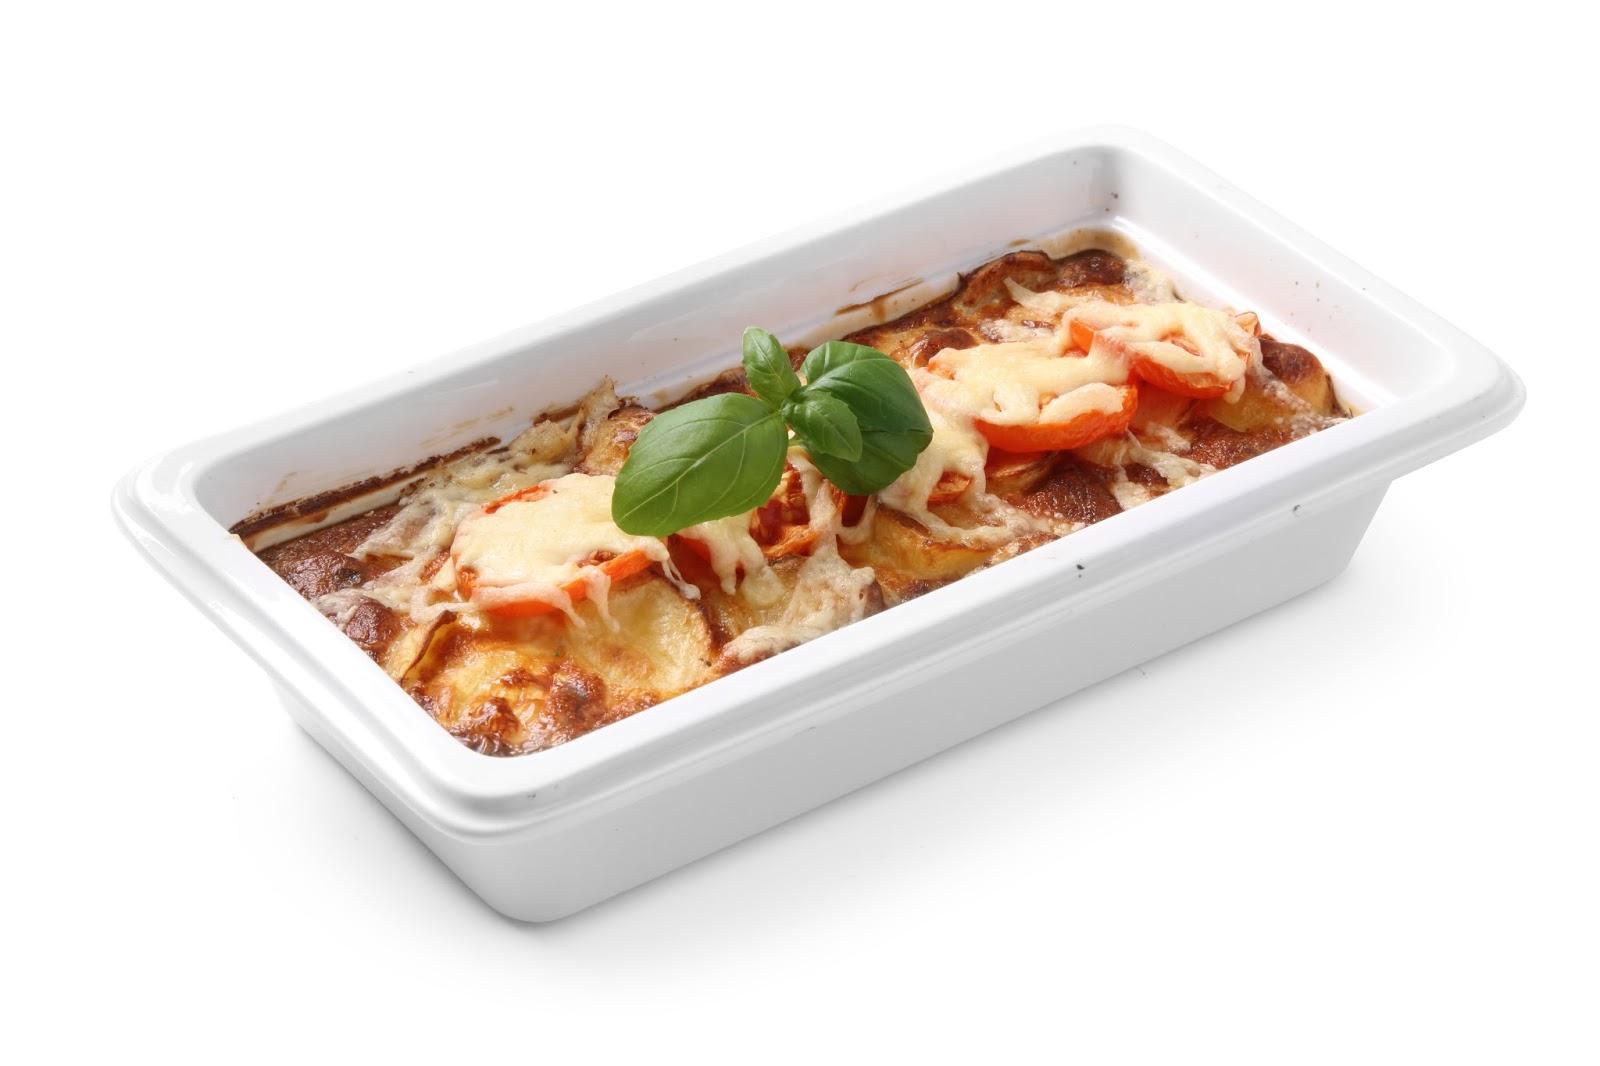 Tava Portelan GN1/3 Profesionala, Recipient de Gastronomie, Tavi gastronorm, Horeca,  Bucatarii Profesionale, wwwamenajarihoreca.ro